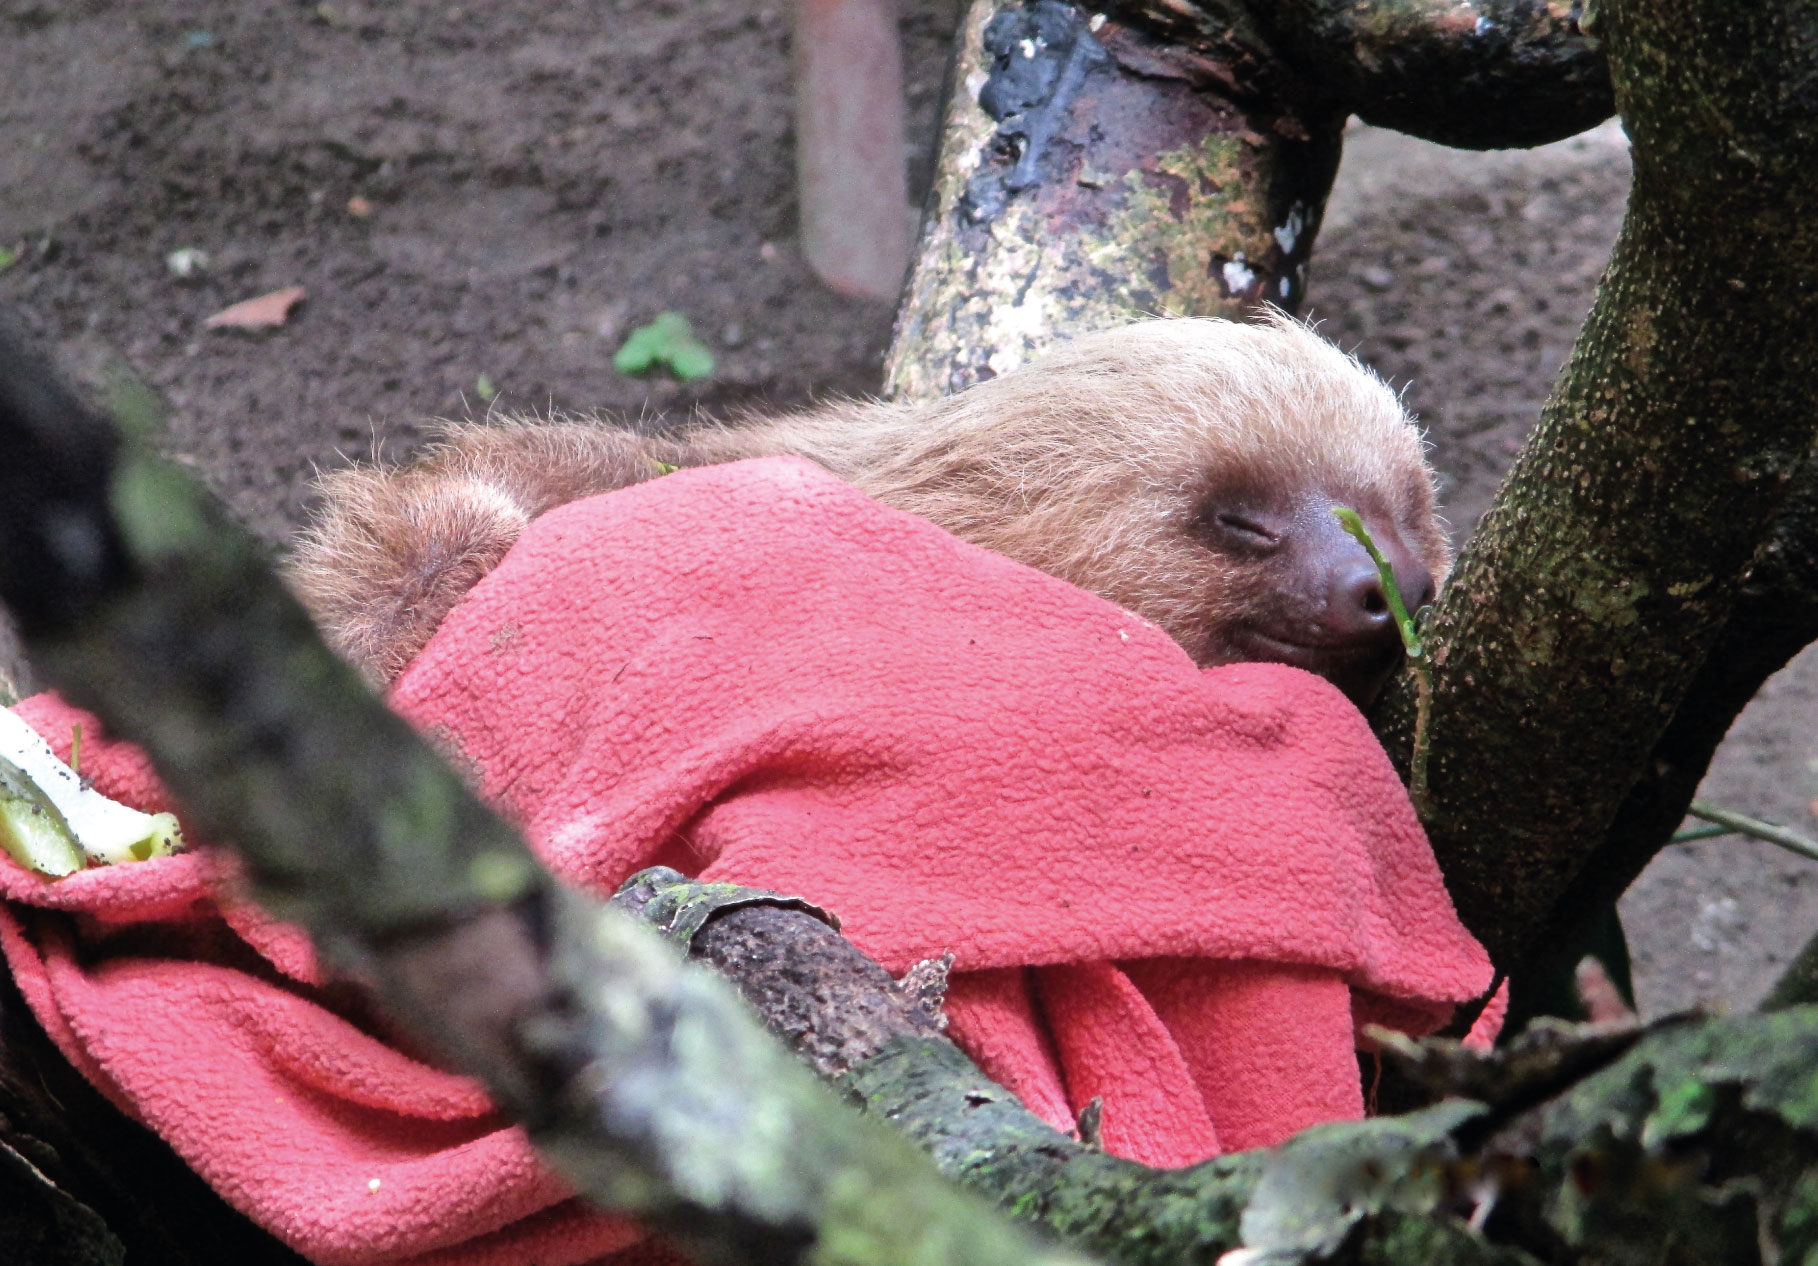 Bébé paresseux au repos